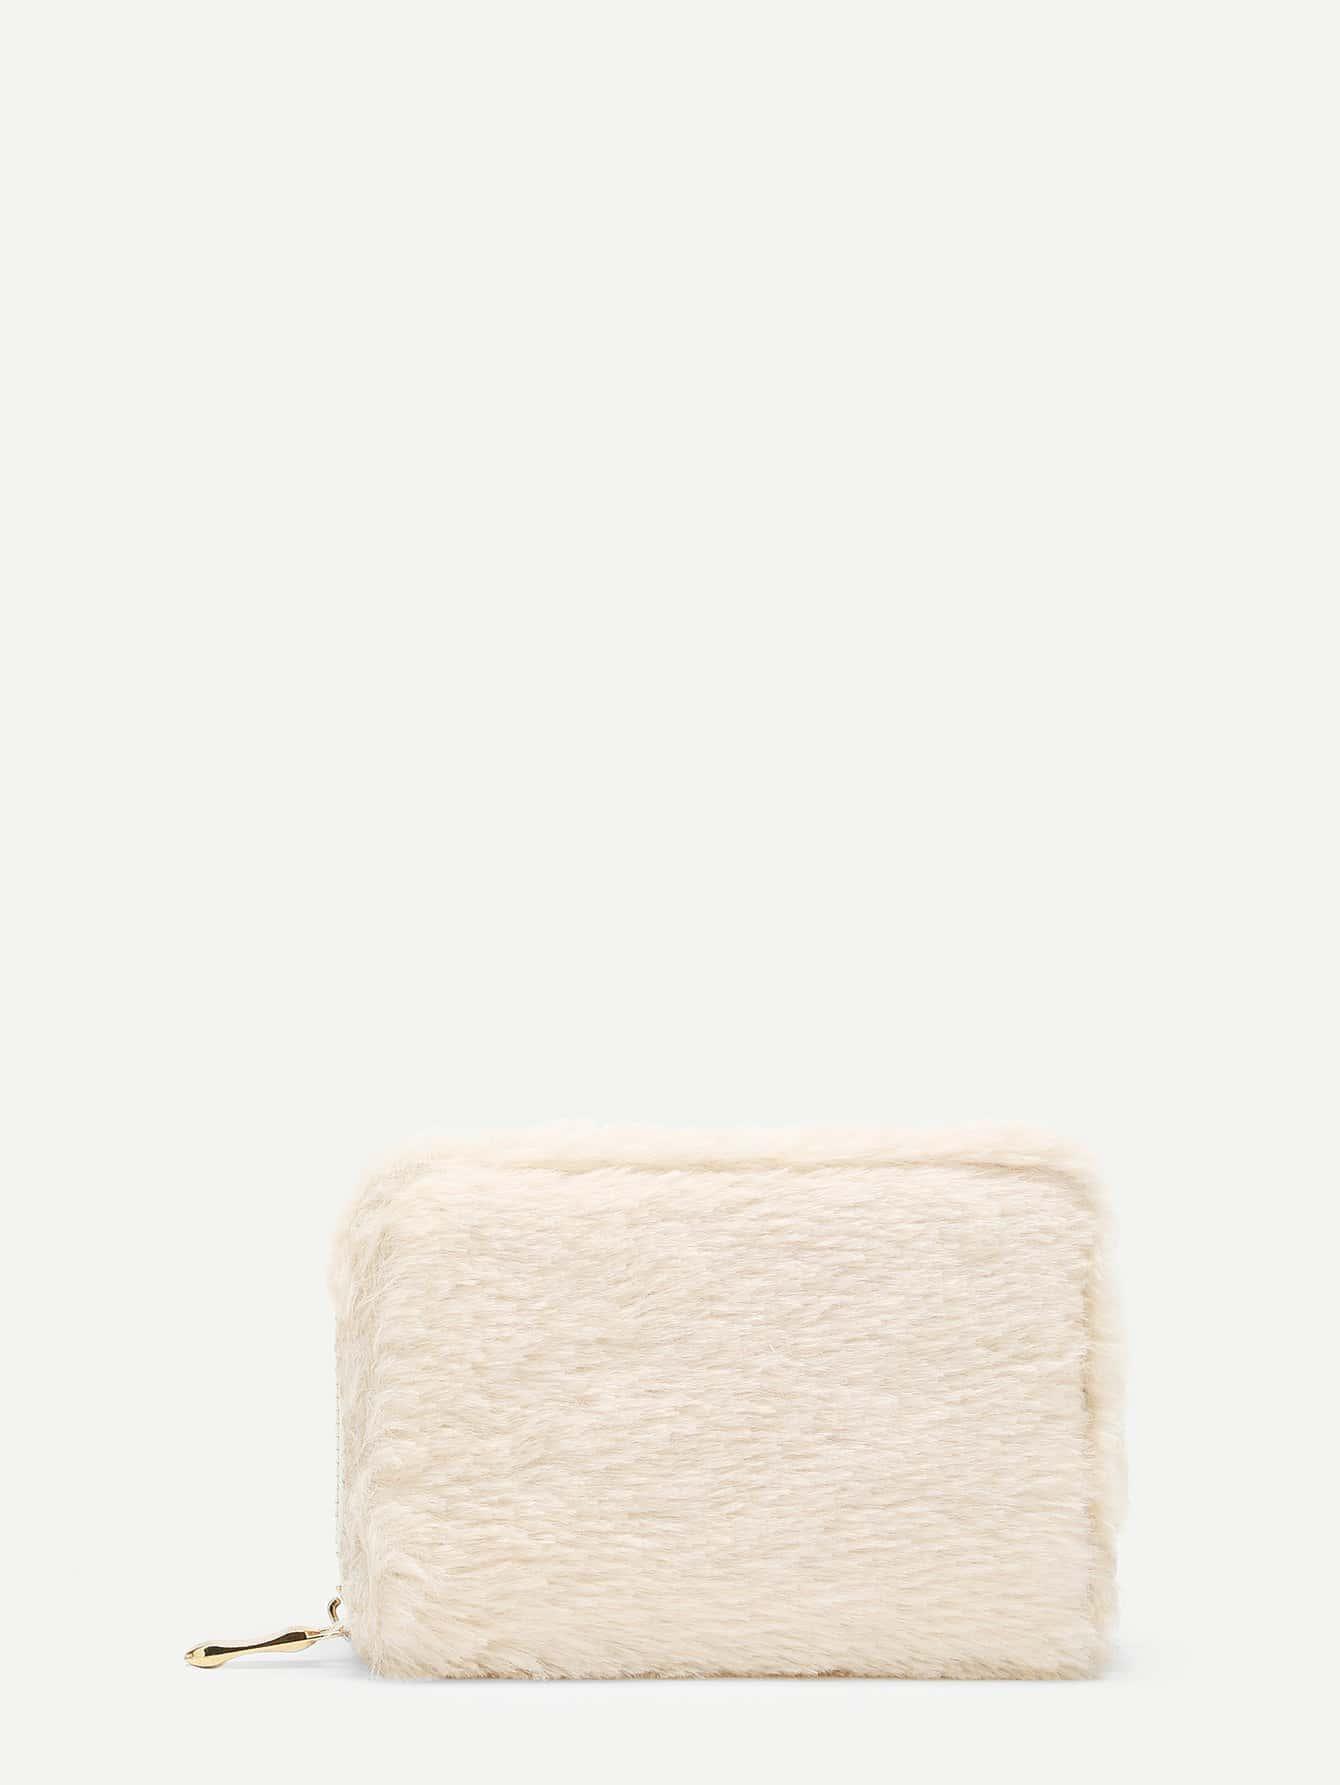 Купить Мех Кошелькиипортмоне белый Сумки, null, SheIn